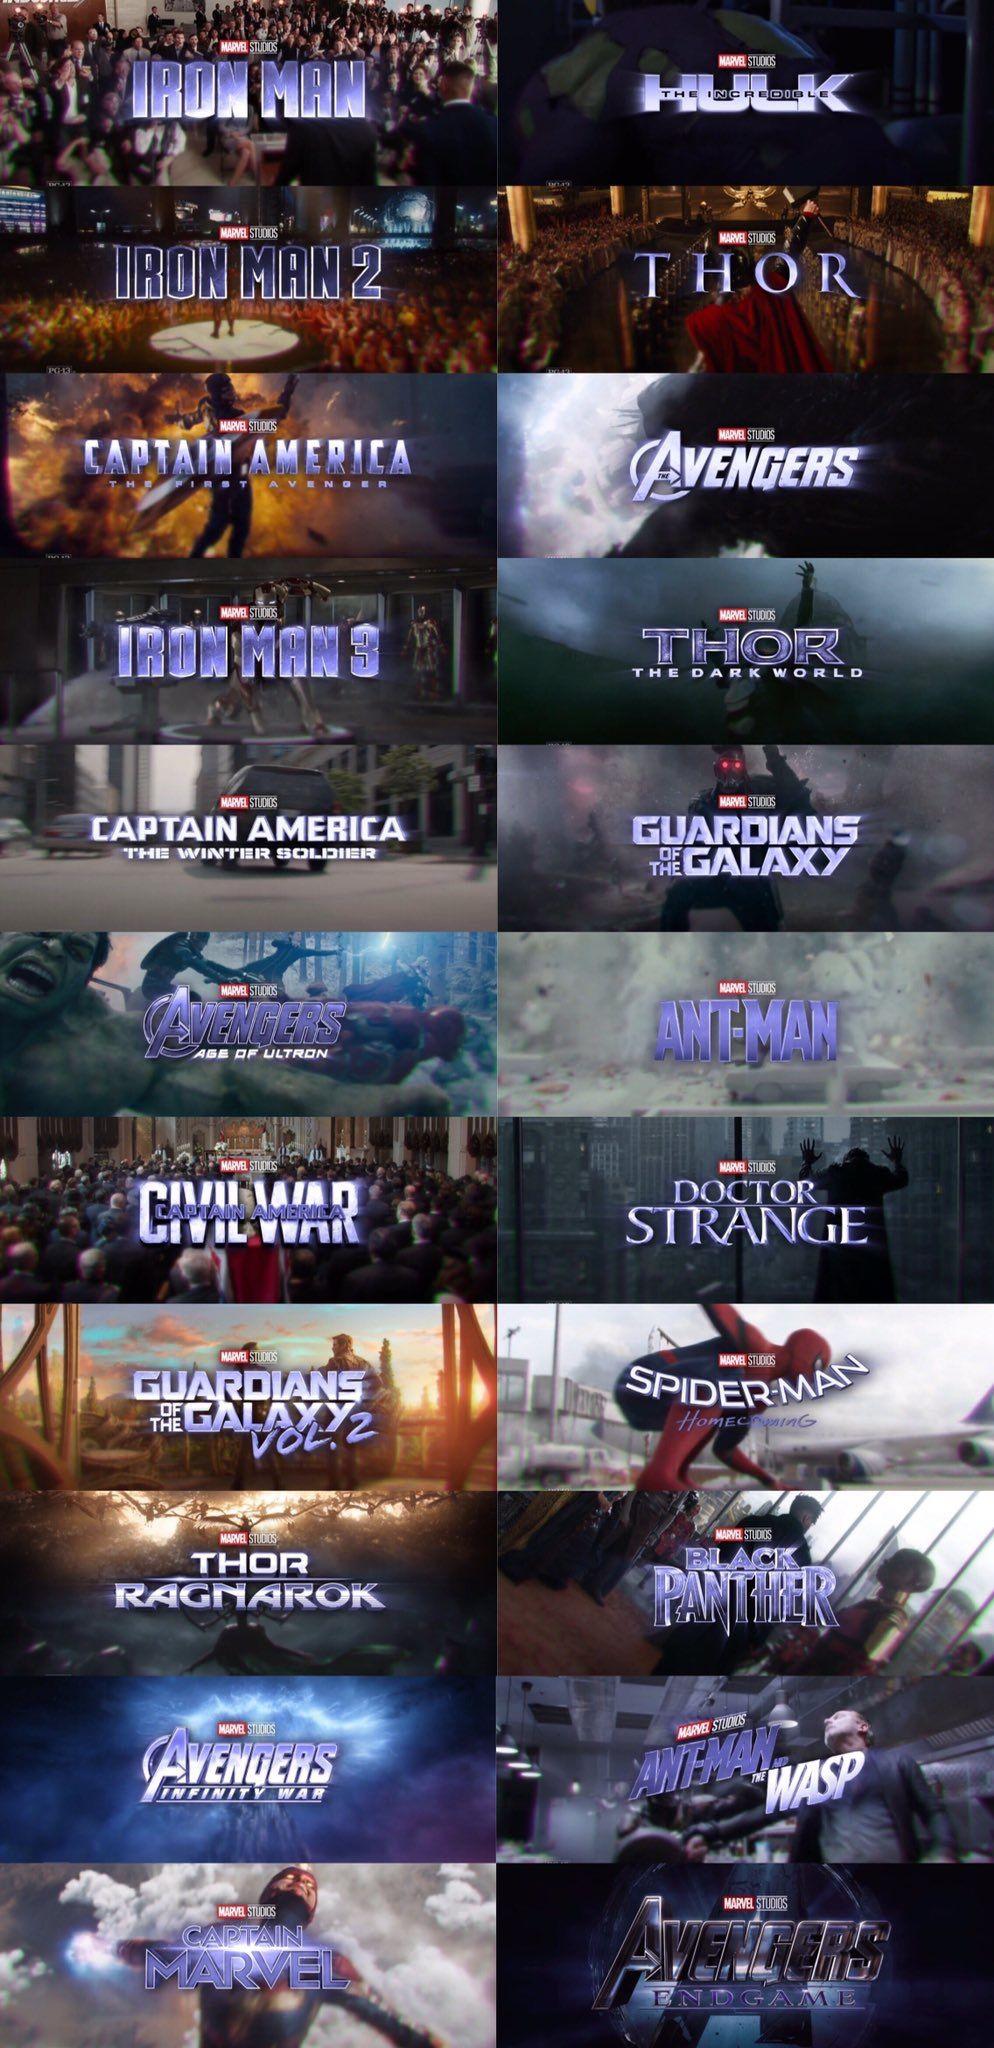 Pin By Emilio Chavarria On Marvel Marvel Marvel Superheroes Marvel Avengers